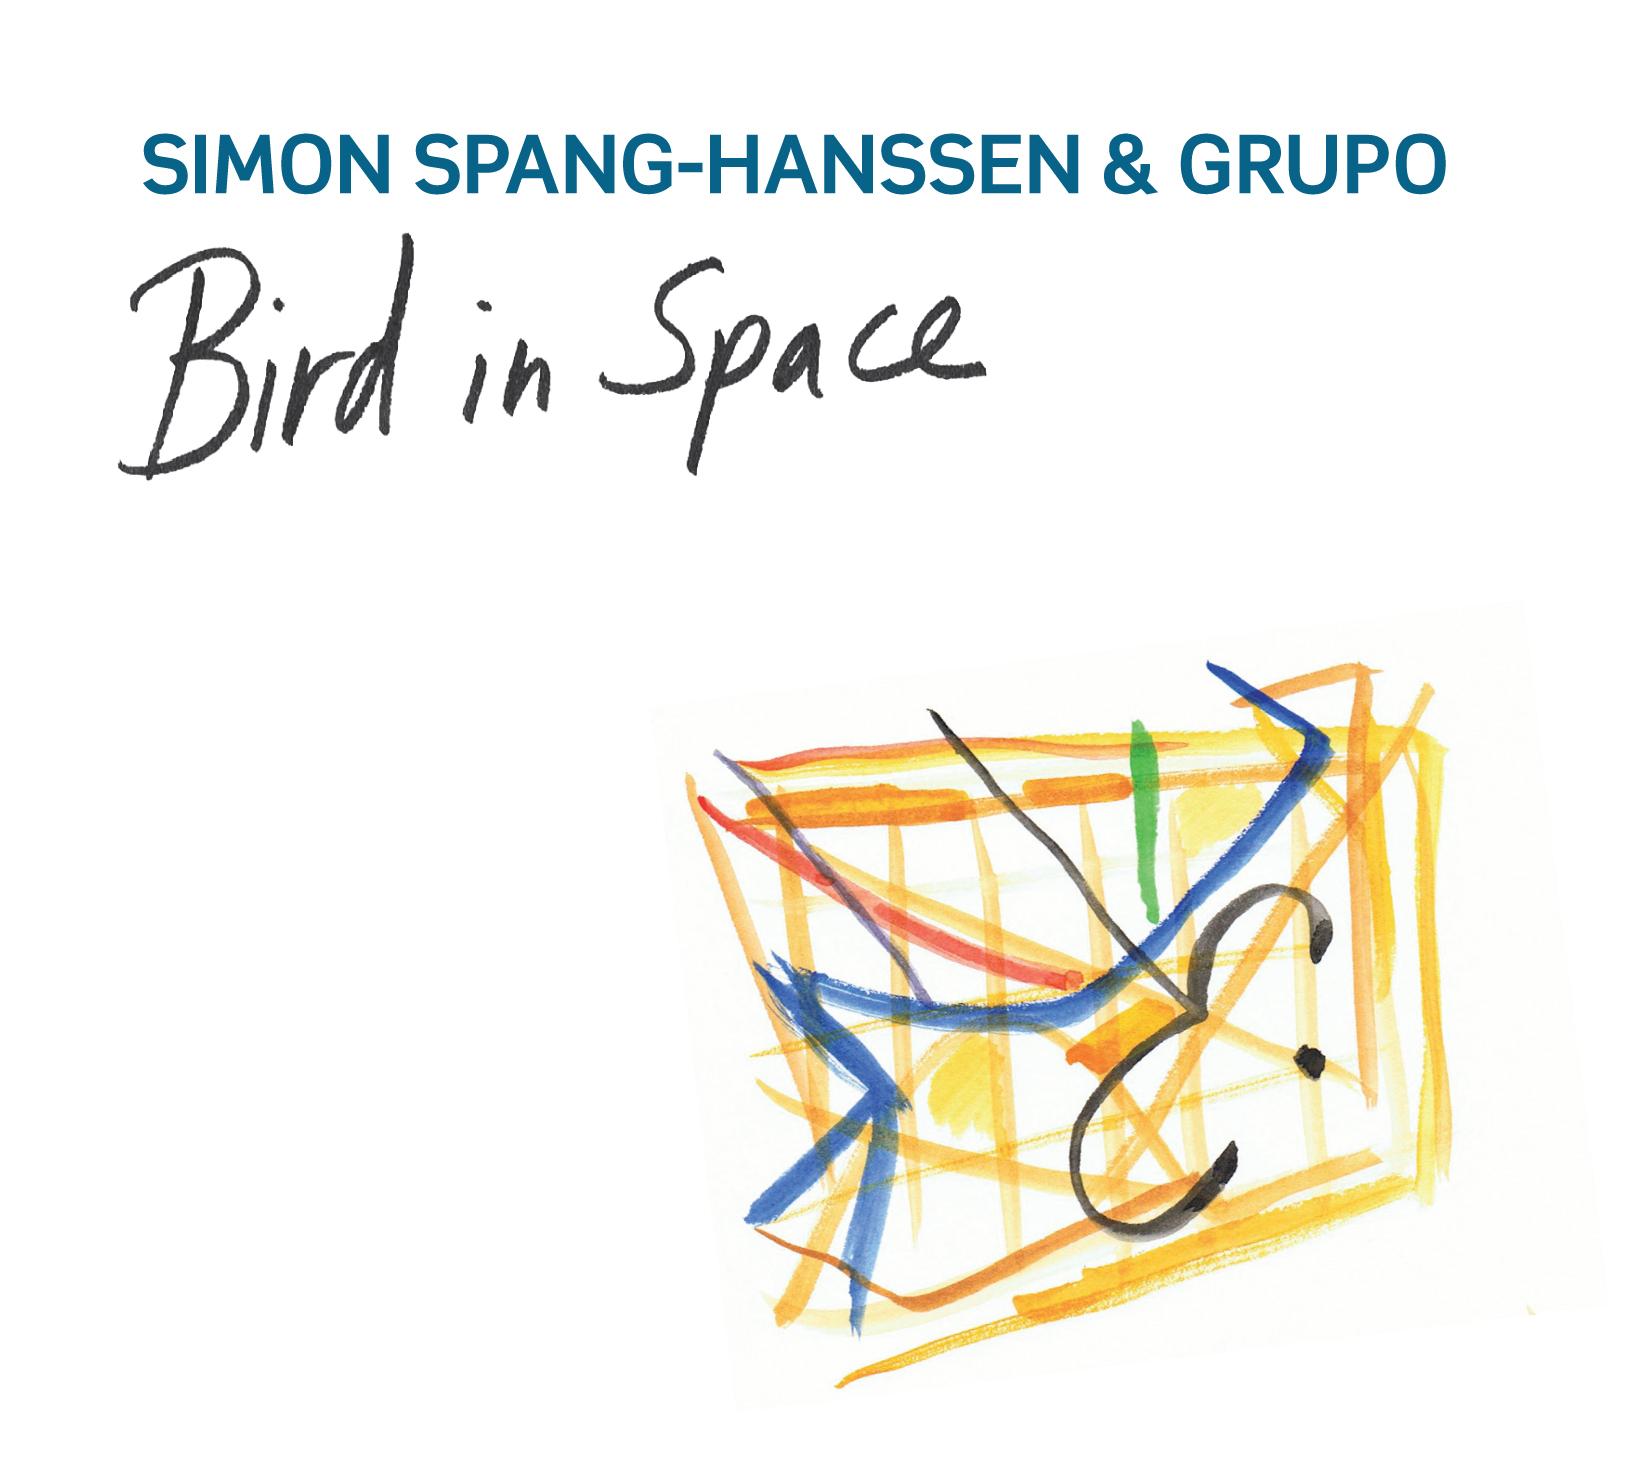 Bird in Space